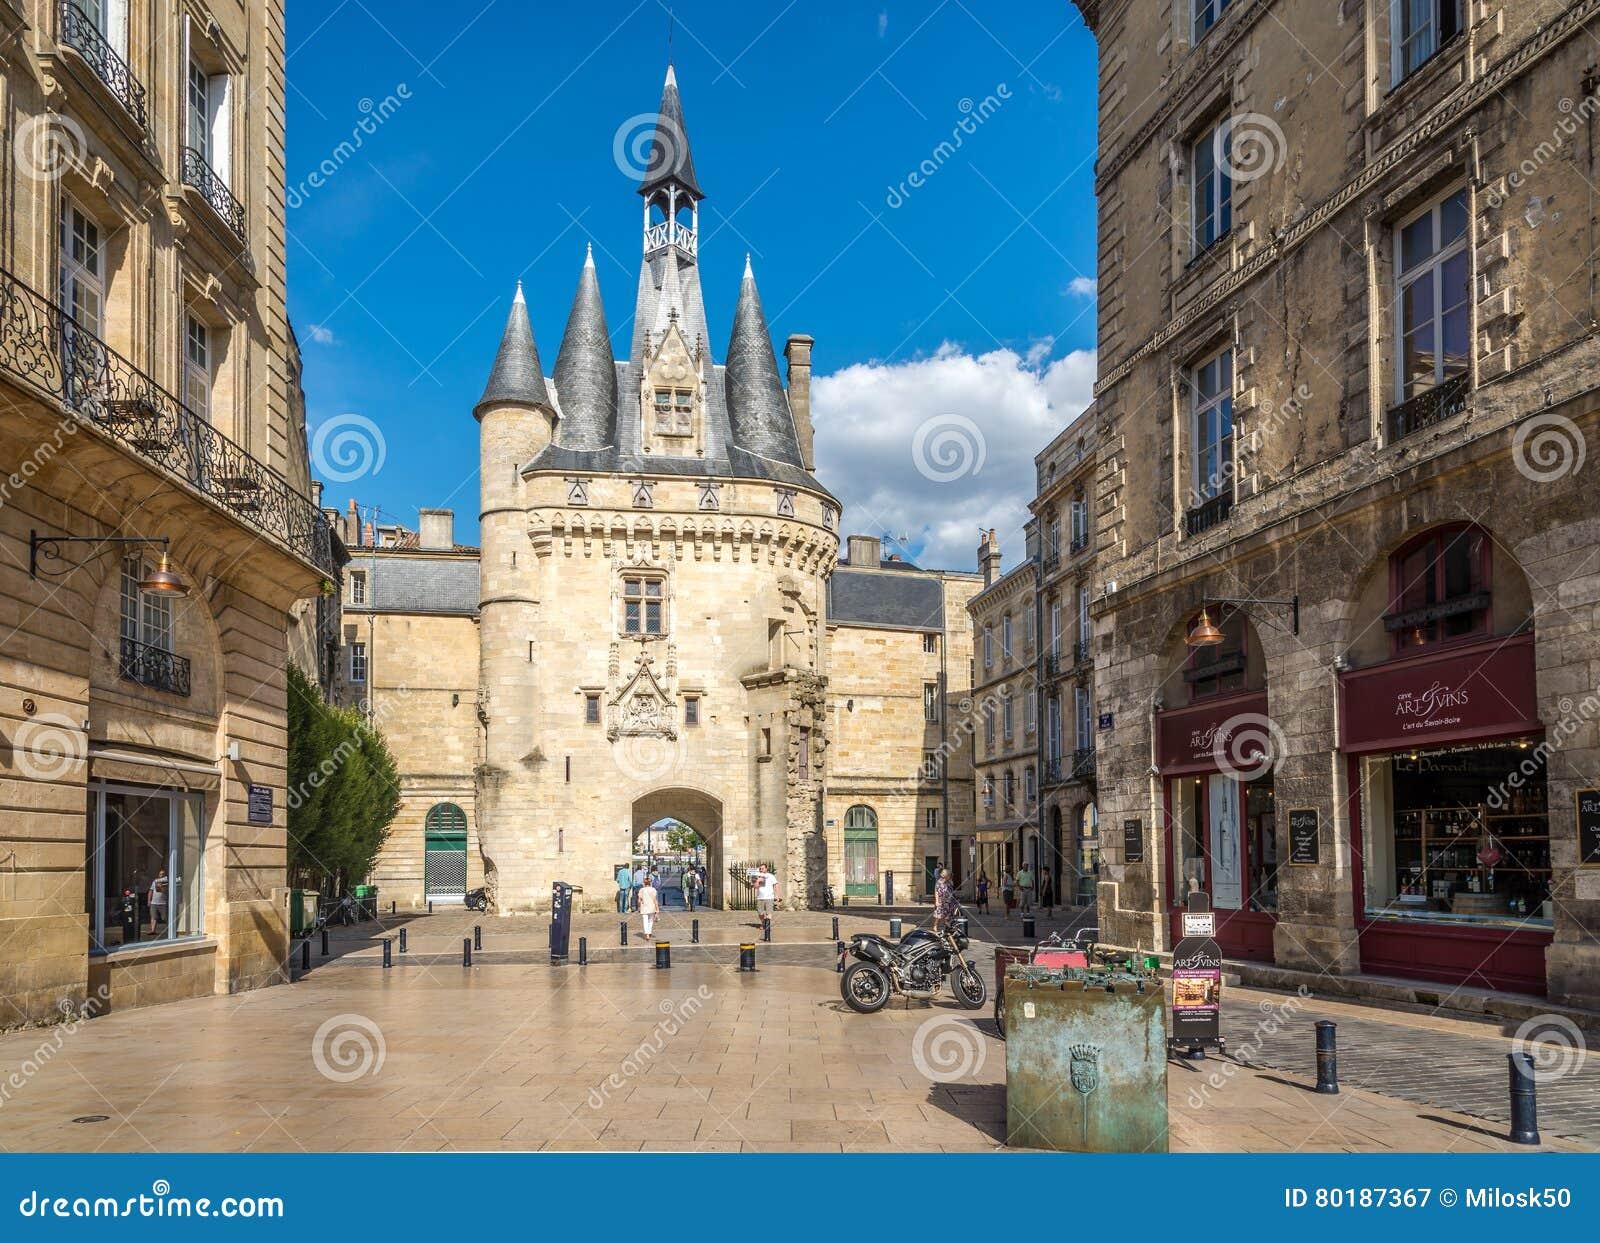 Straat dichtbij Poort Cailhau - Porte Cailhau in Bordeaux - Frankrijk